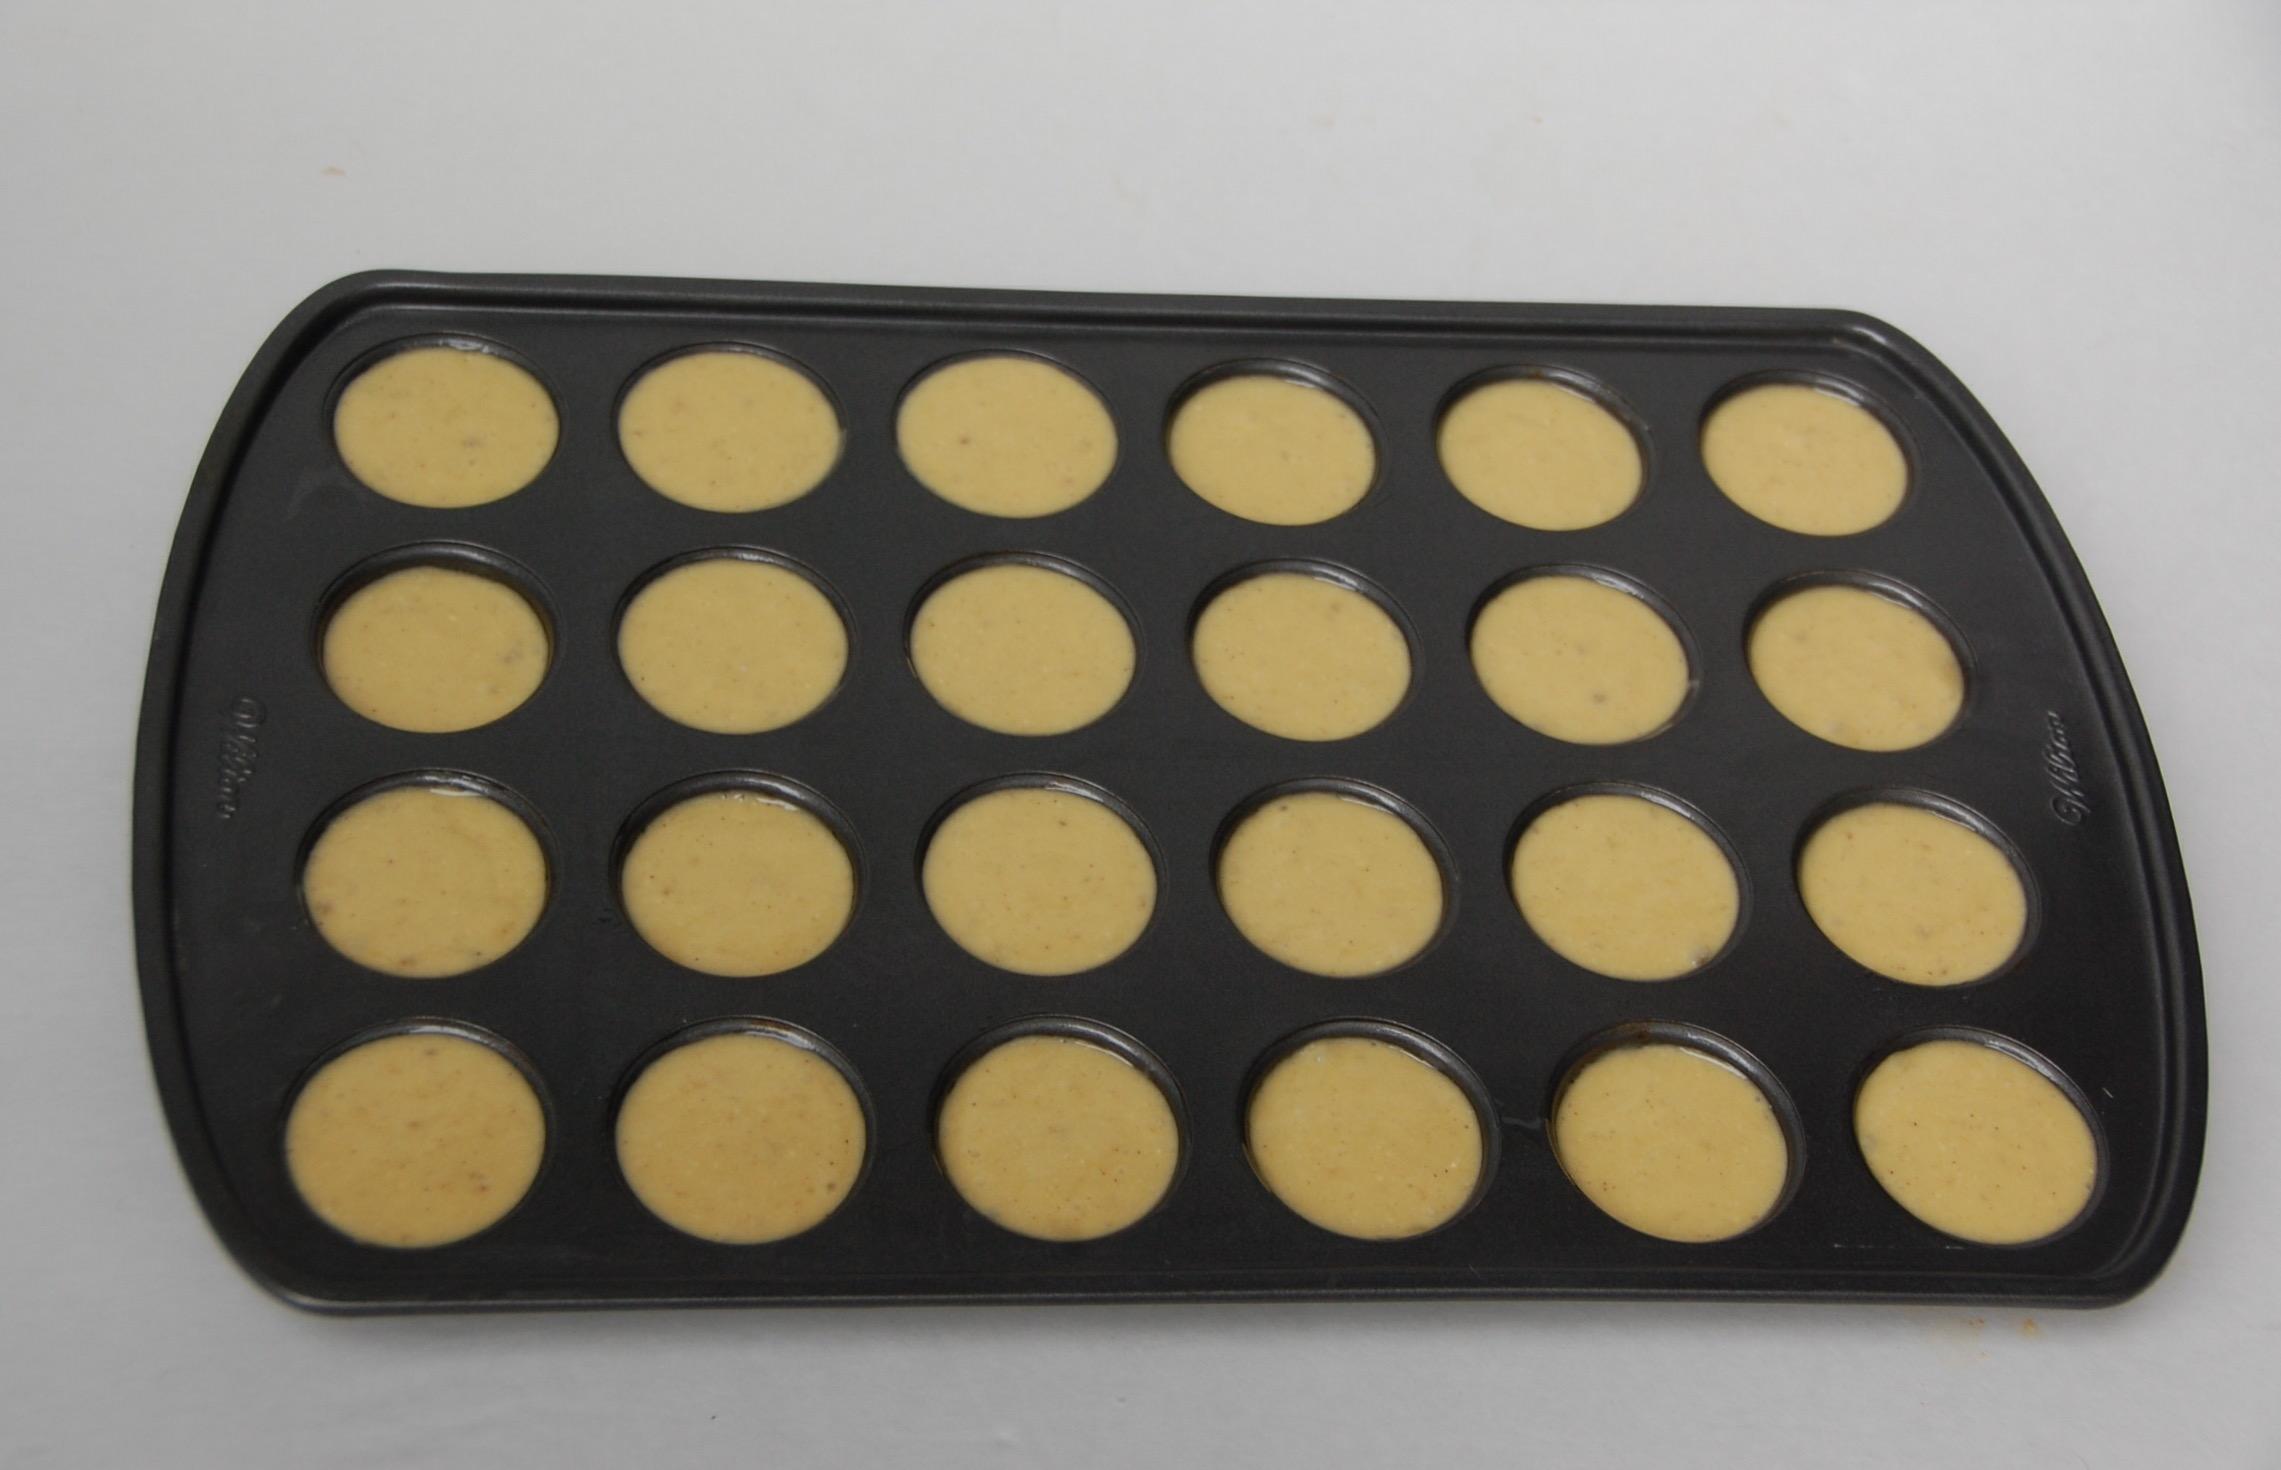 Pour Cake Batter into Mini Muffin Pan to make Banana Muffins - Crockpot Empire